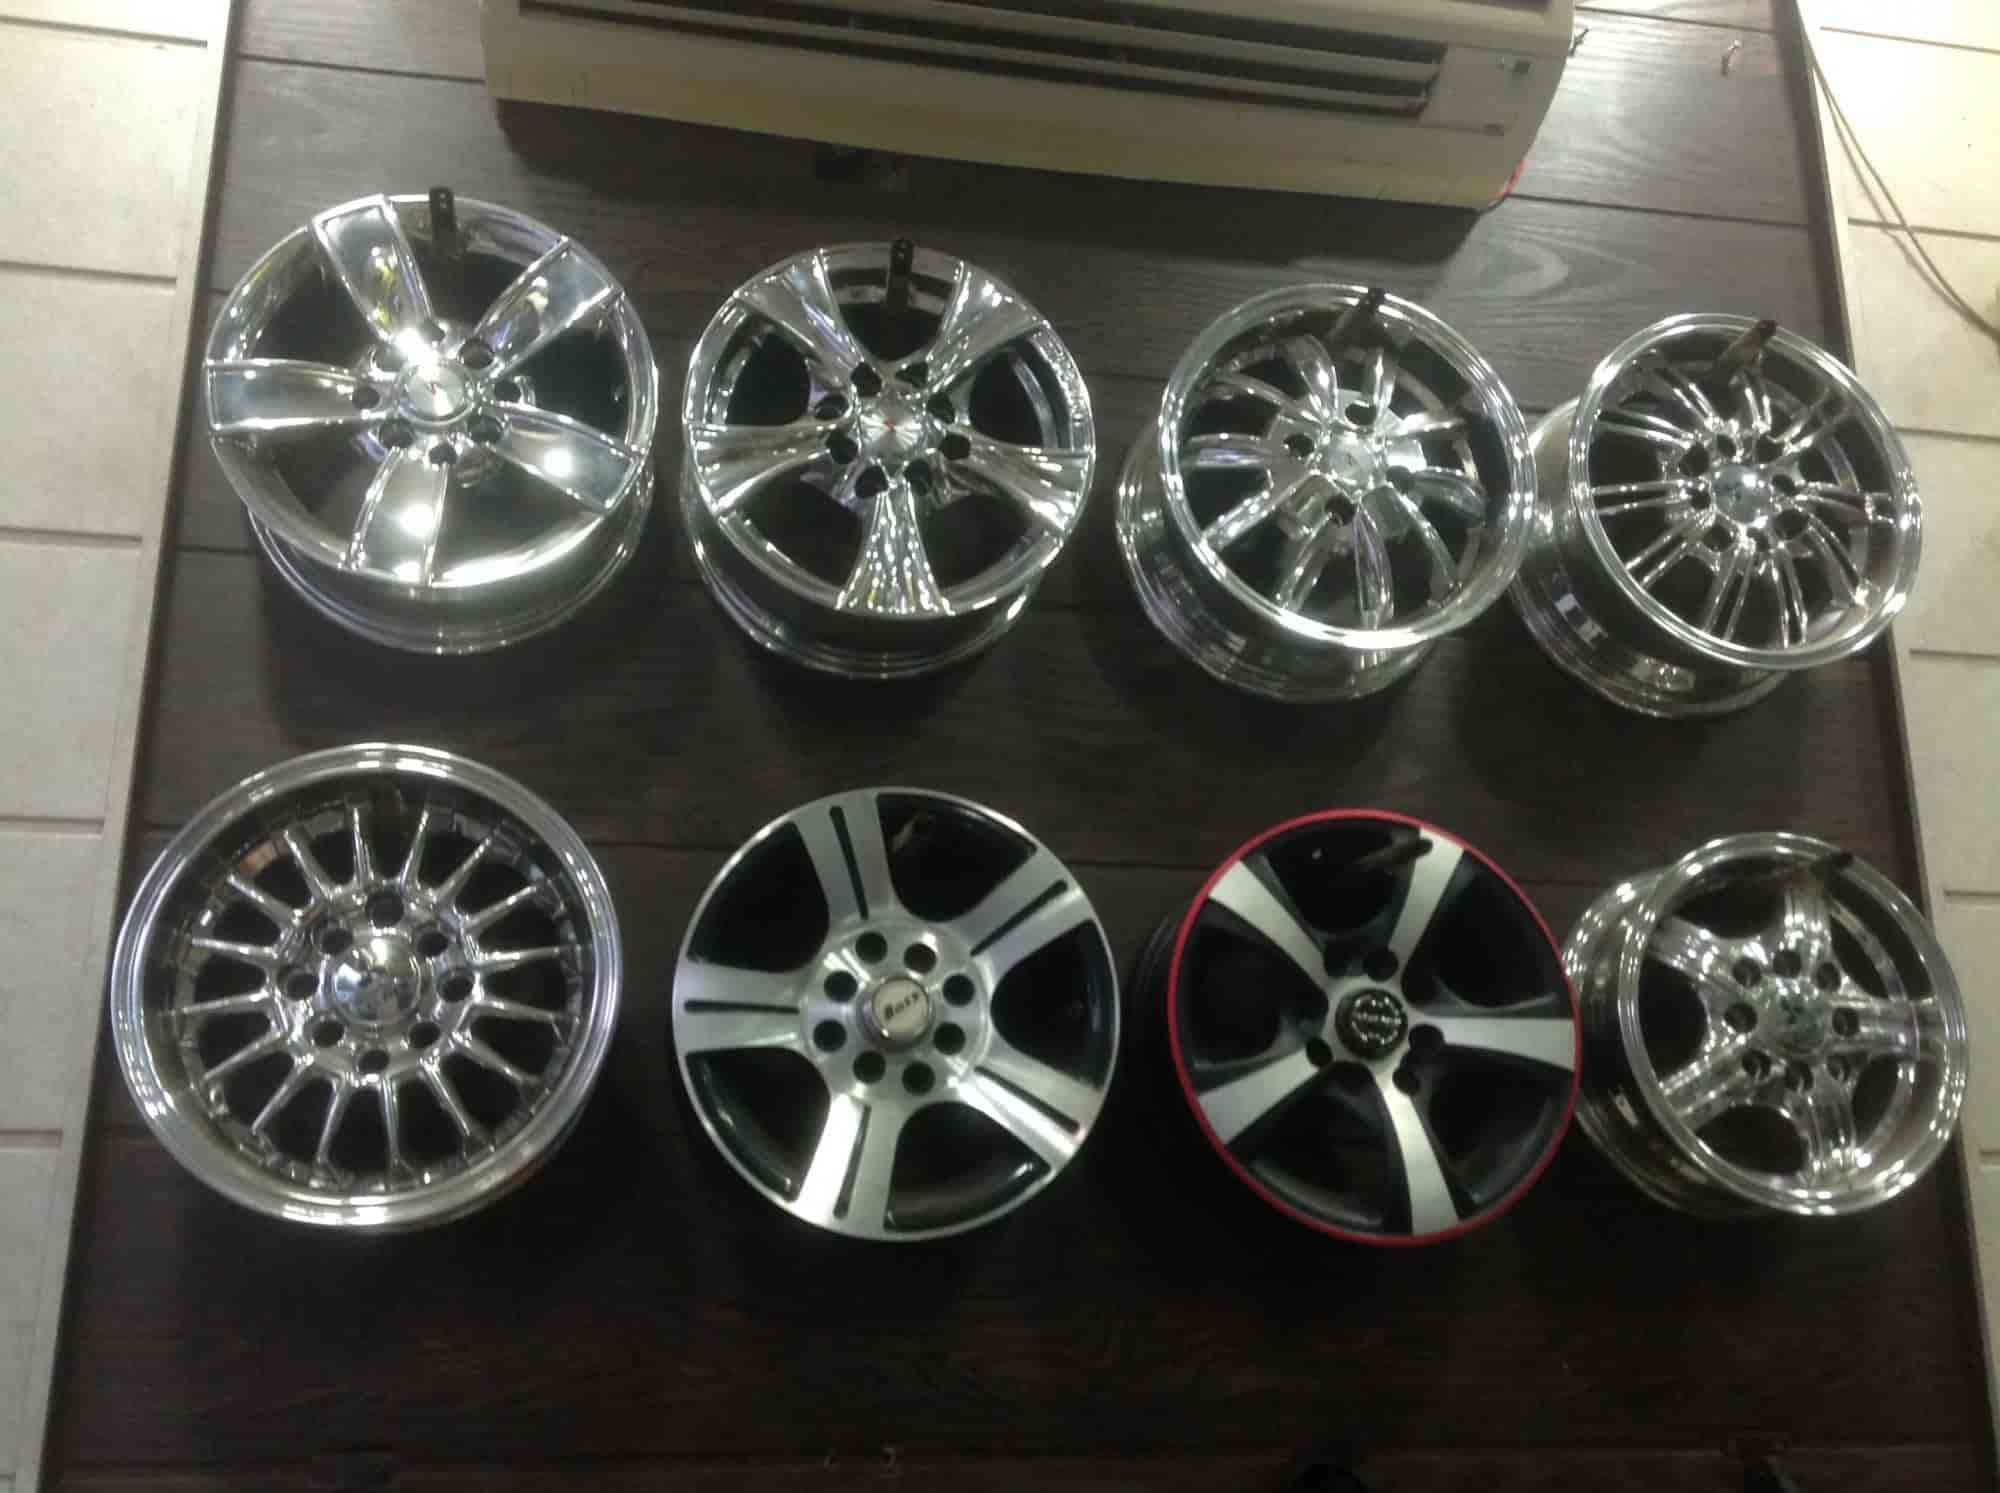 Top Second Hand Alloy Wheel Dealers in Khanna - सेकंड हैंड एलाय व्हील  डीलर्स, खन्ना - Best Second Hand Tyre Rim Dealers - Justdial